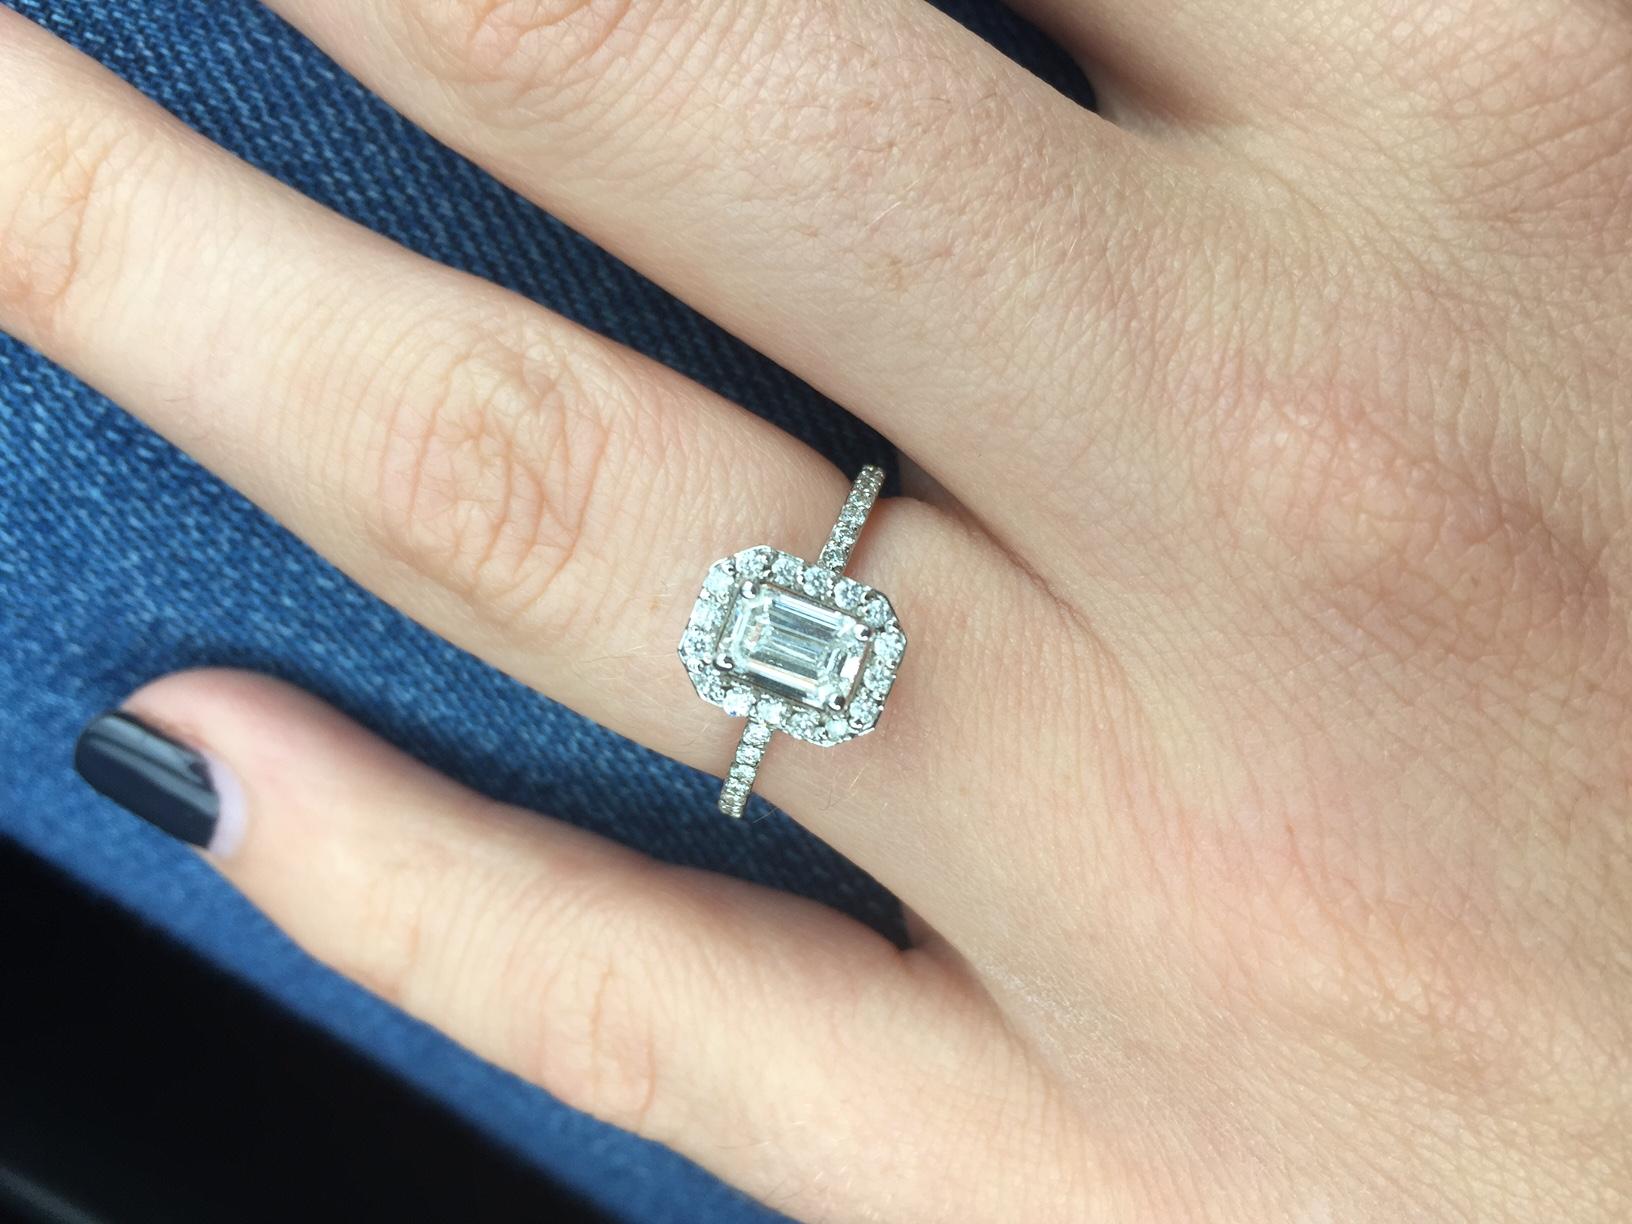 My 07ct Emerald Cut Diamond With Delicate Halo